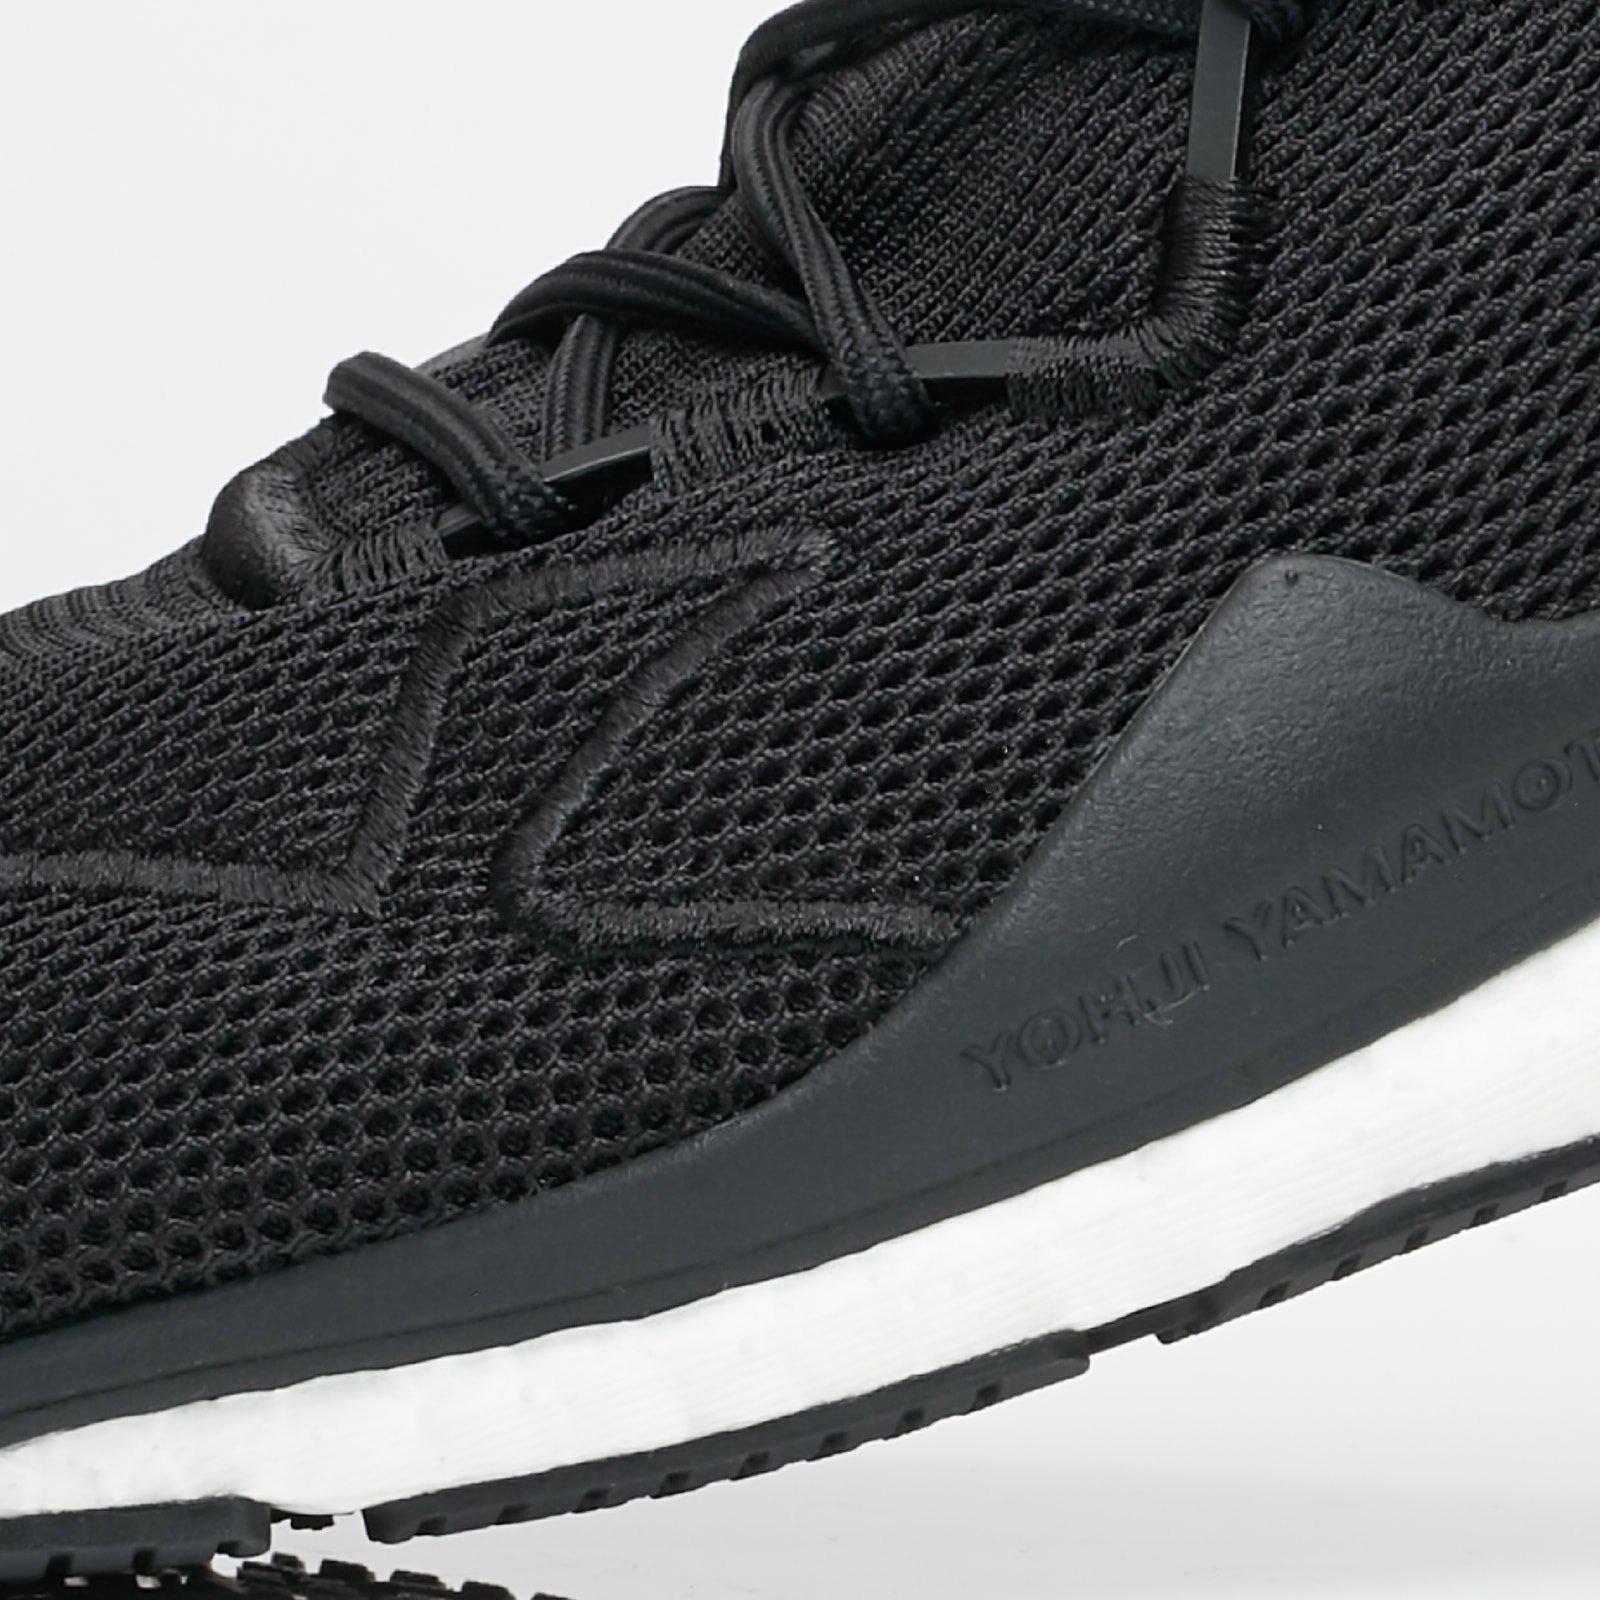 a9dff507377a adidas Y-3 Adizero Runner - D97837 - Sneakersnstuff